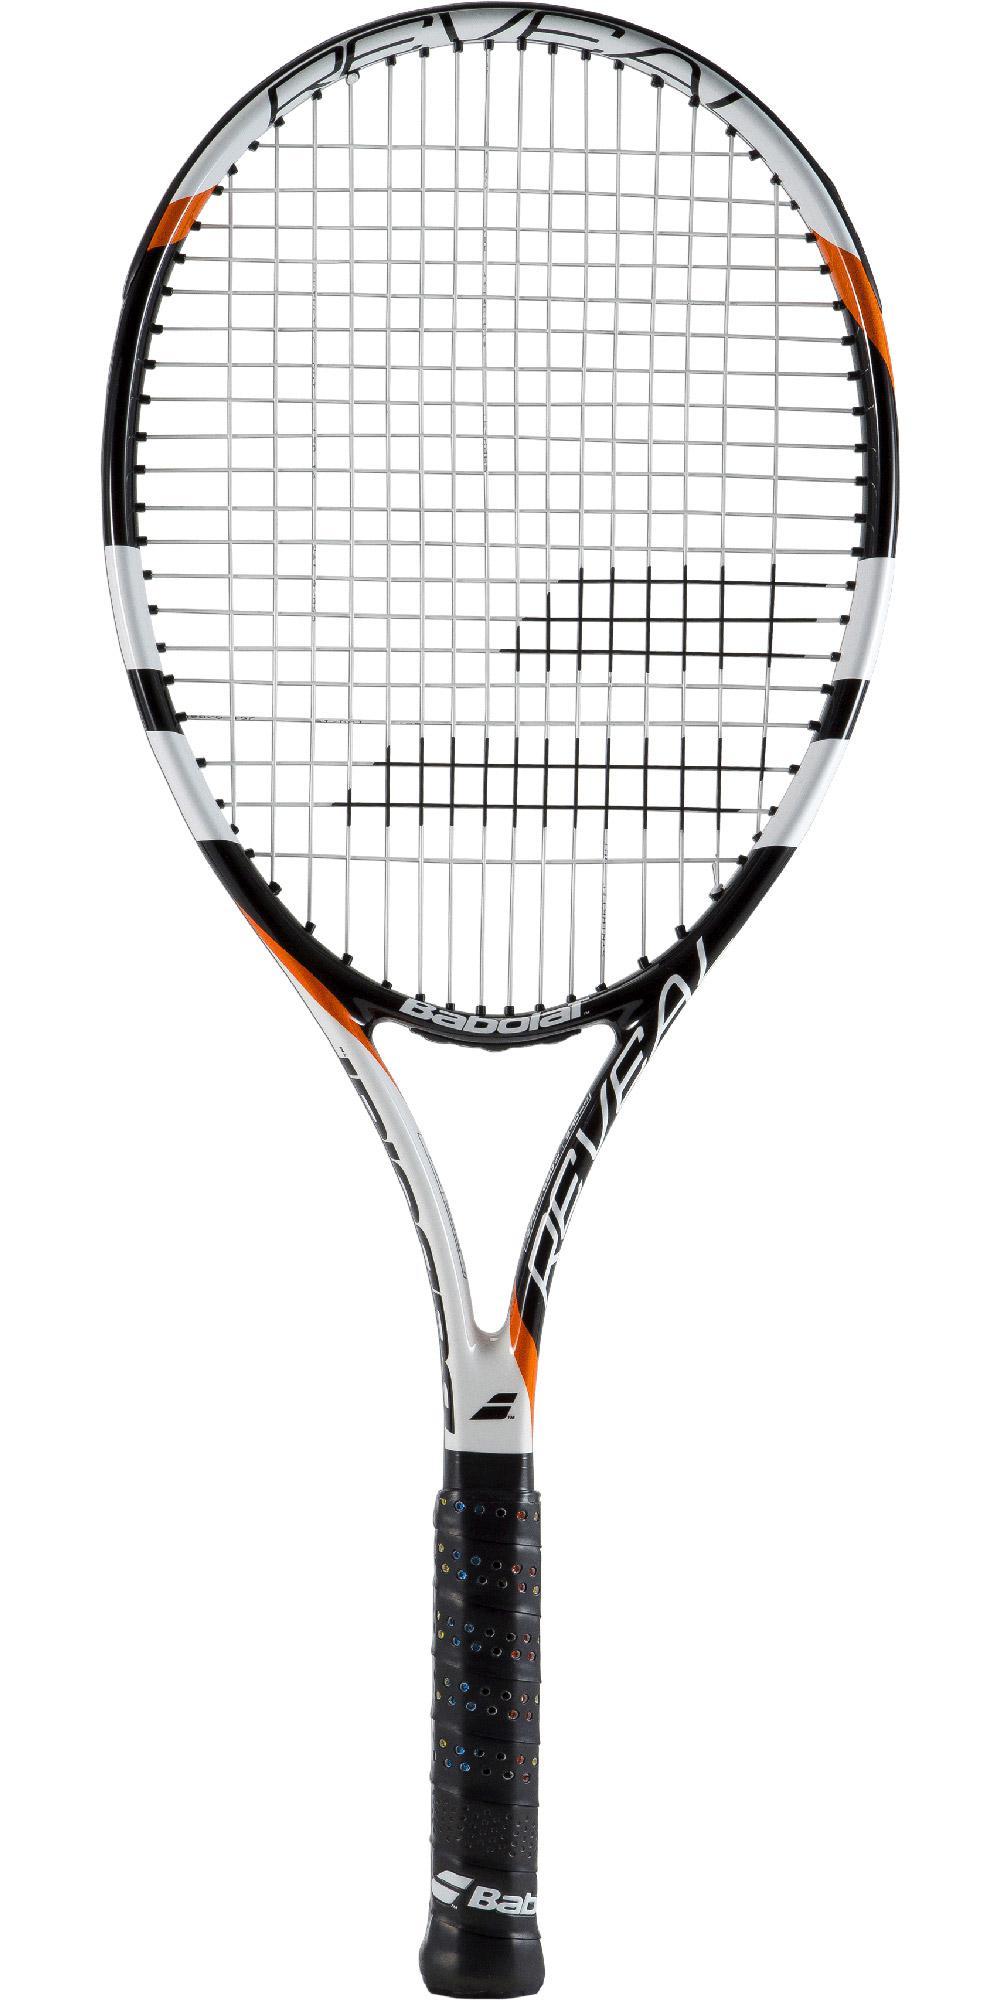 online retailer ec98b cbceb Babolat Reveal Tennis Racket Kit (+ 3 Balls) - Black/White